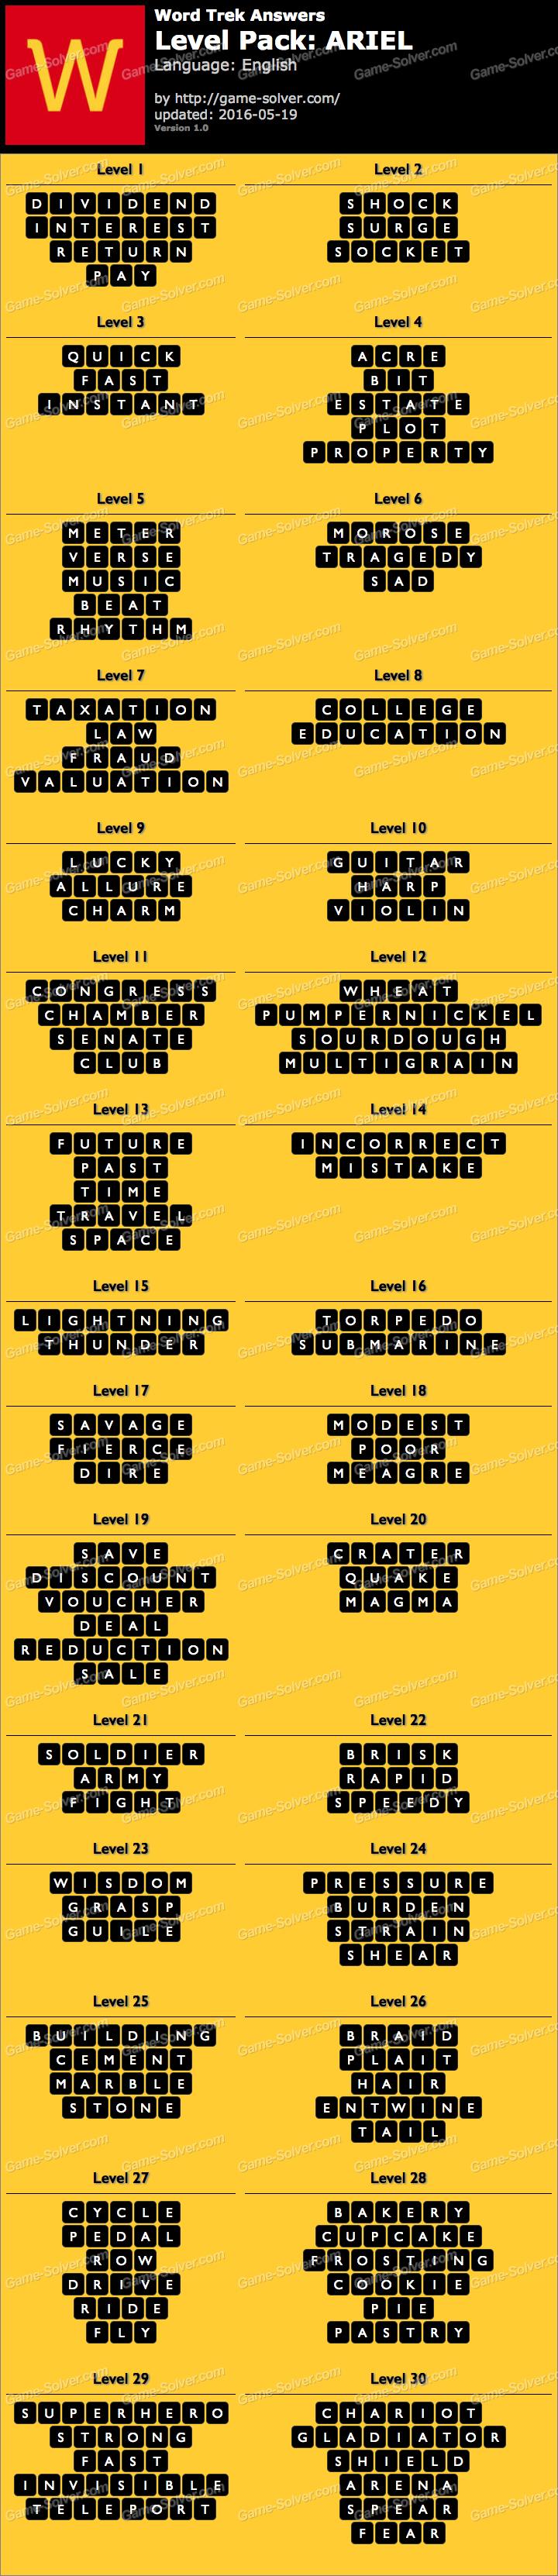 Word Trek Level Pack 76 ARIEL Answers